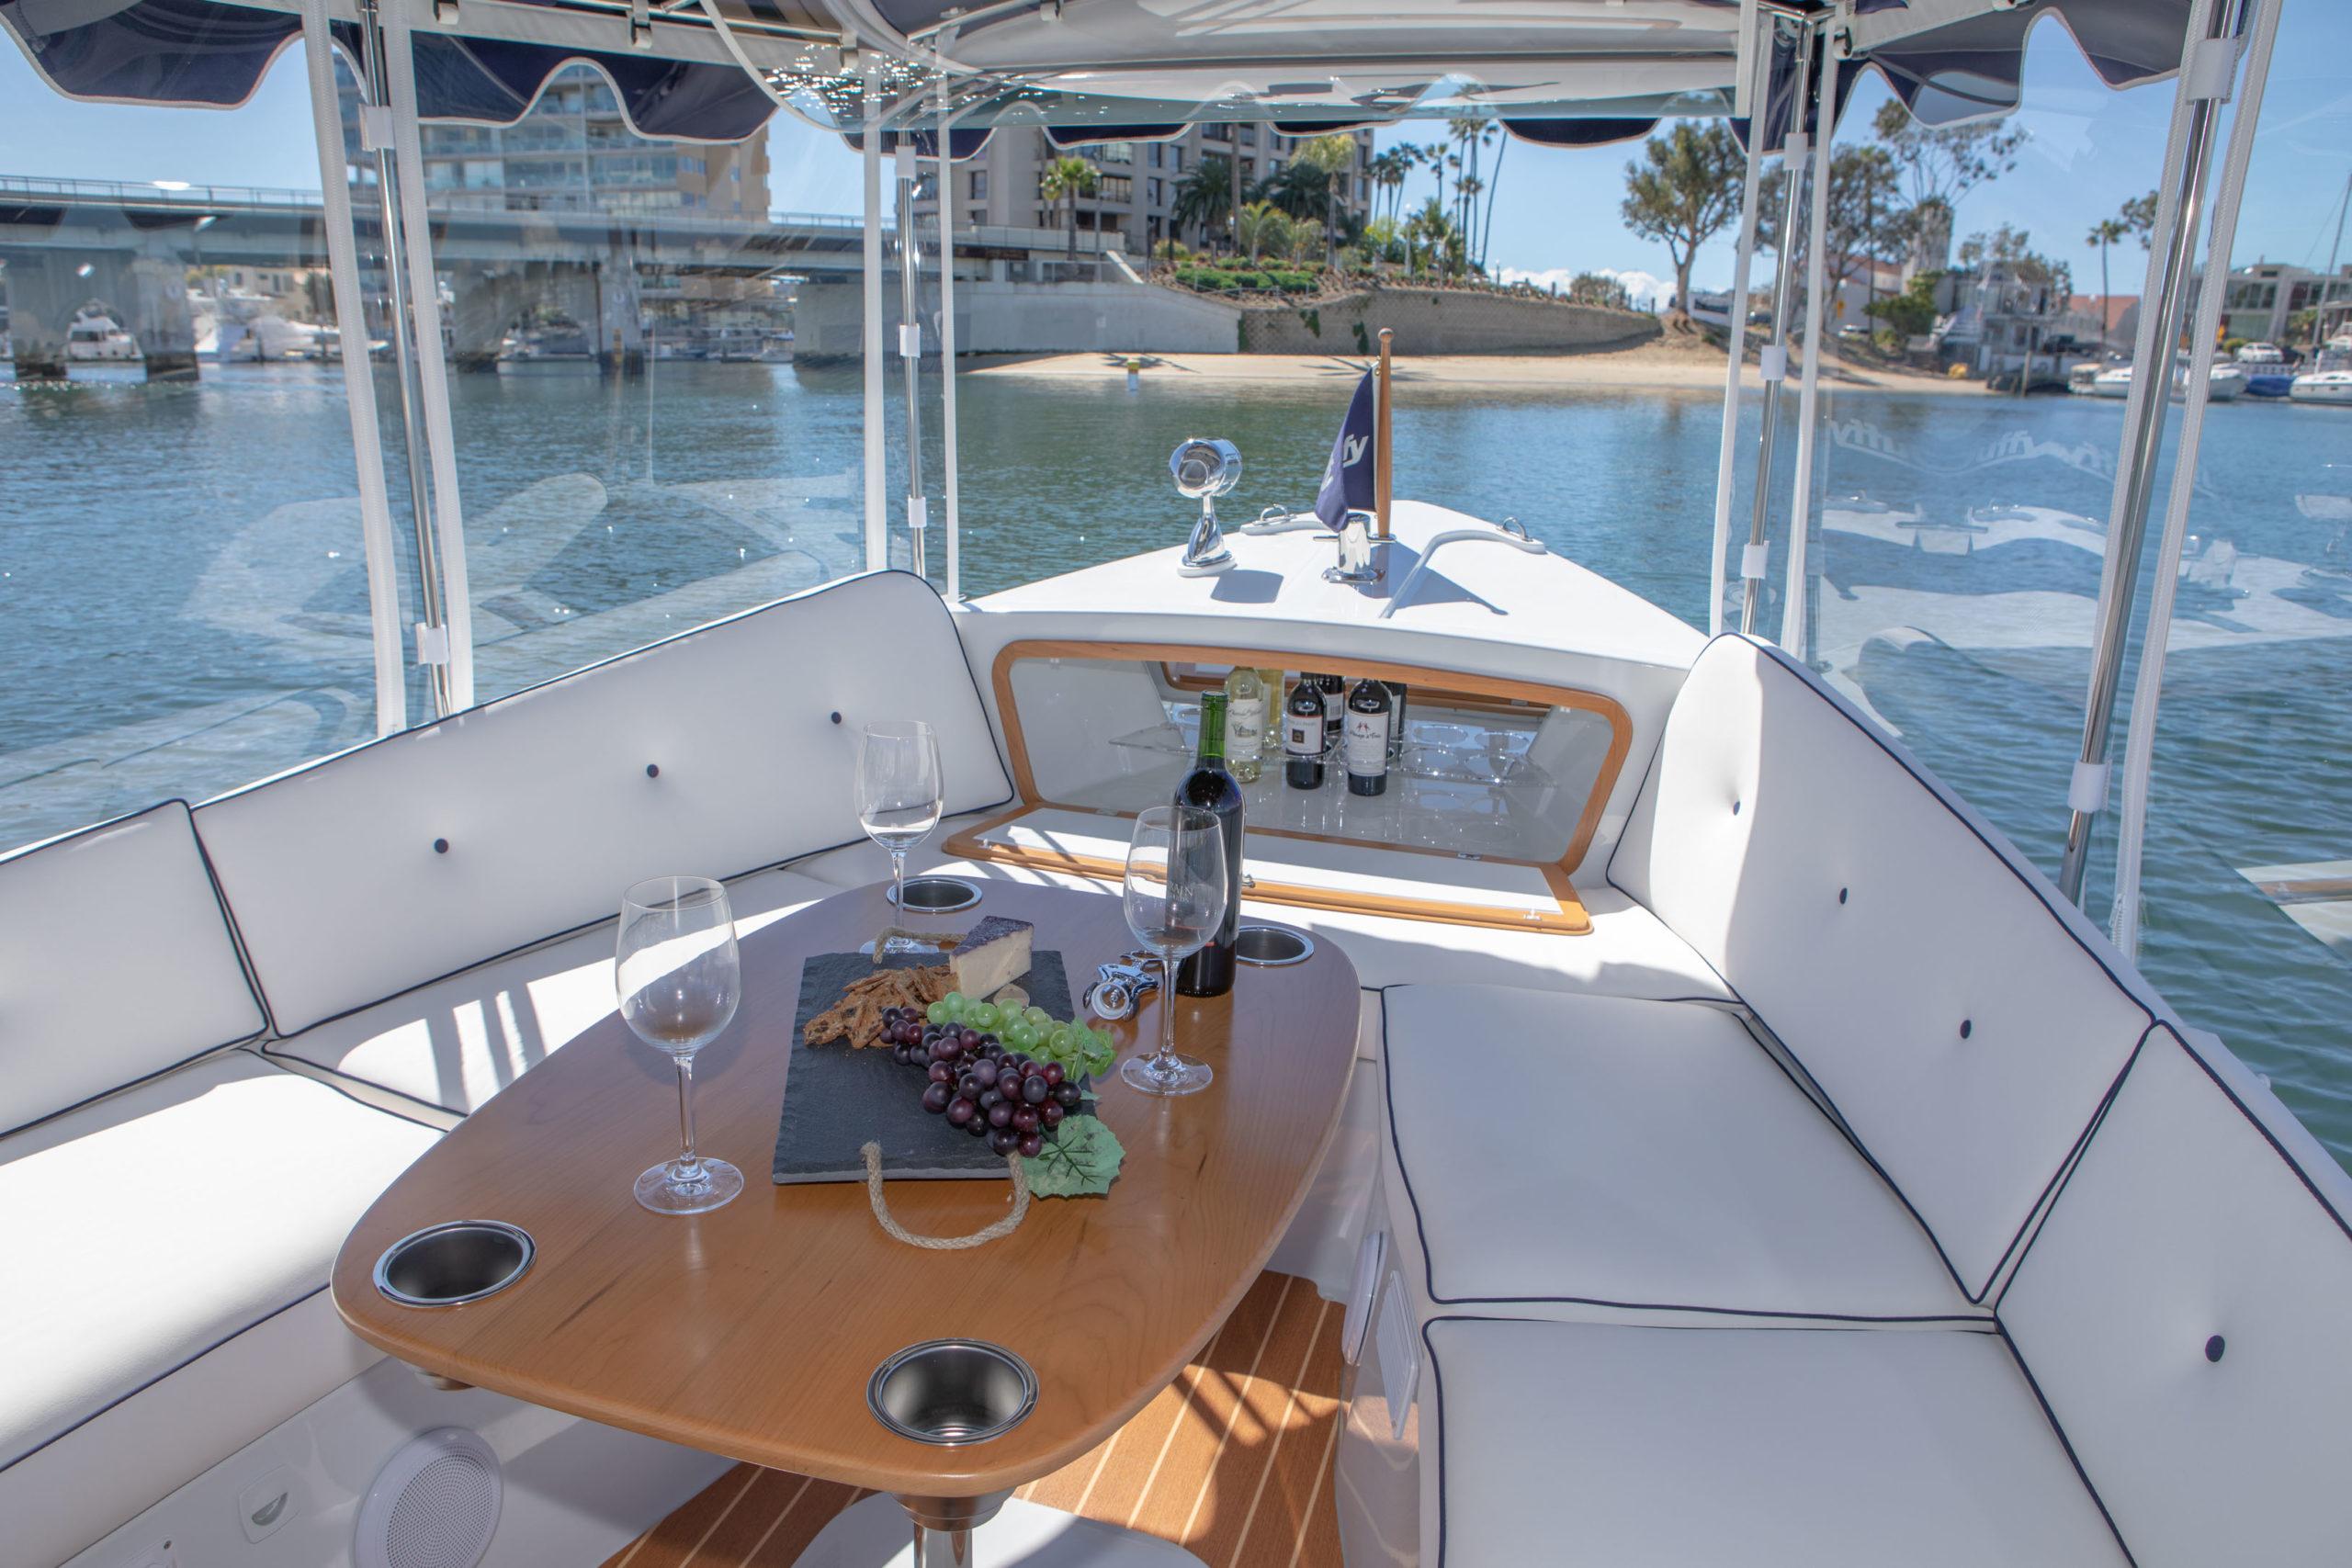 Duffy-Electric-Boats-22-Sun-Cruiser-Interior-2020-9